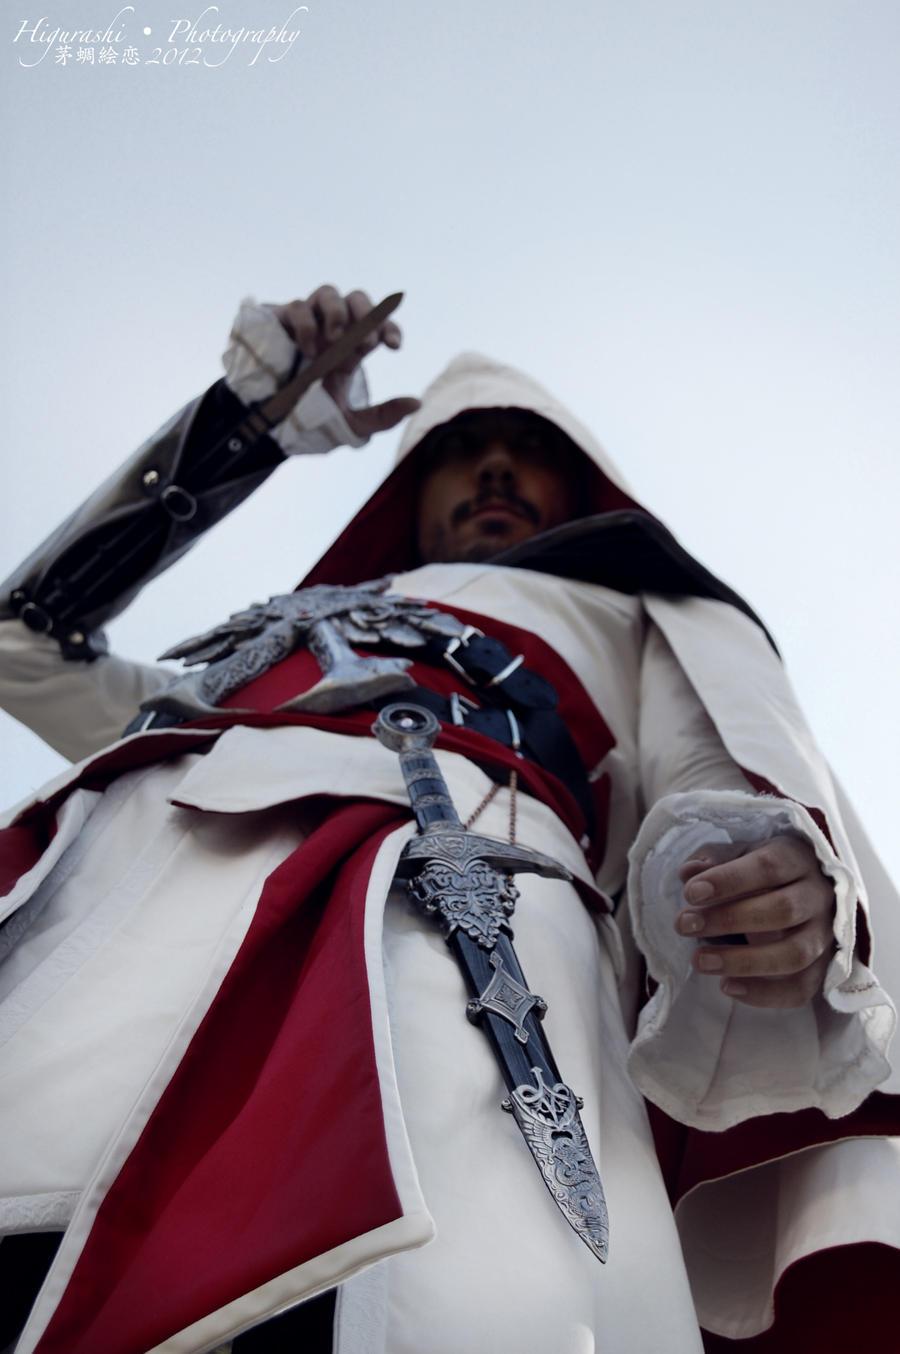 Ezio - Assassin's Creed XV by theredviper